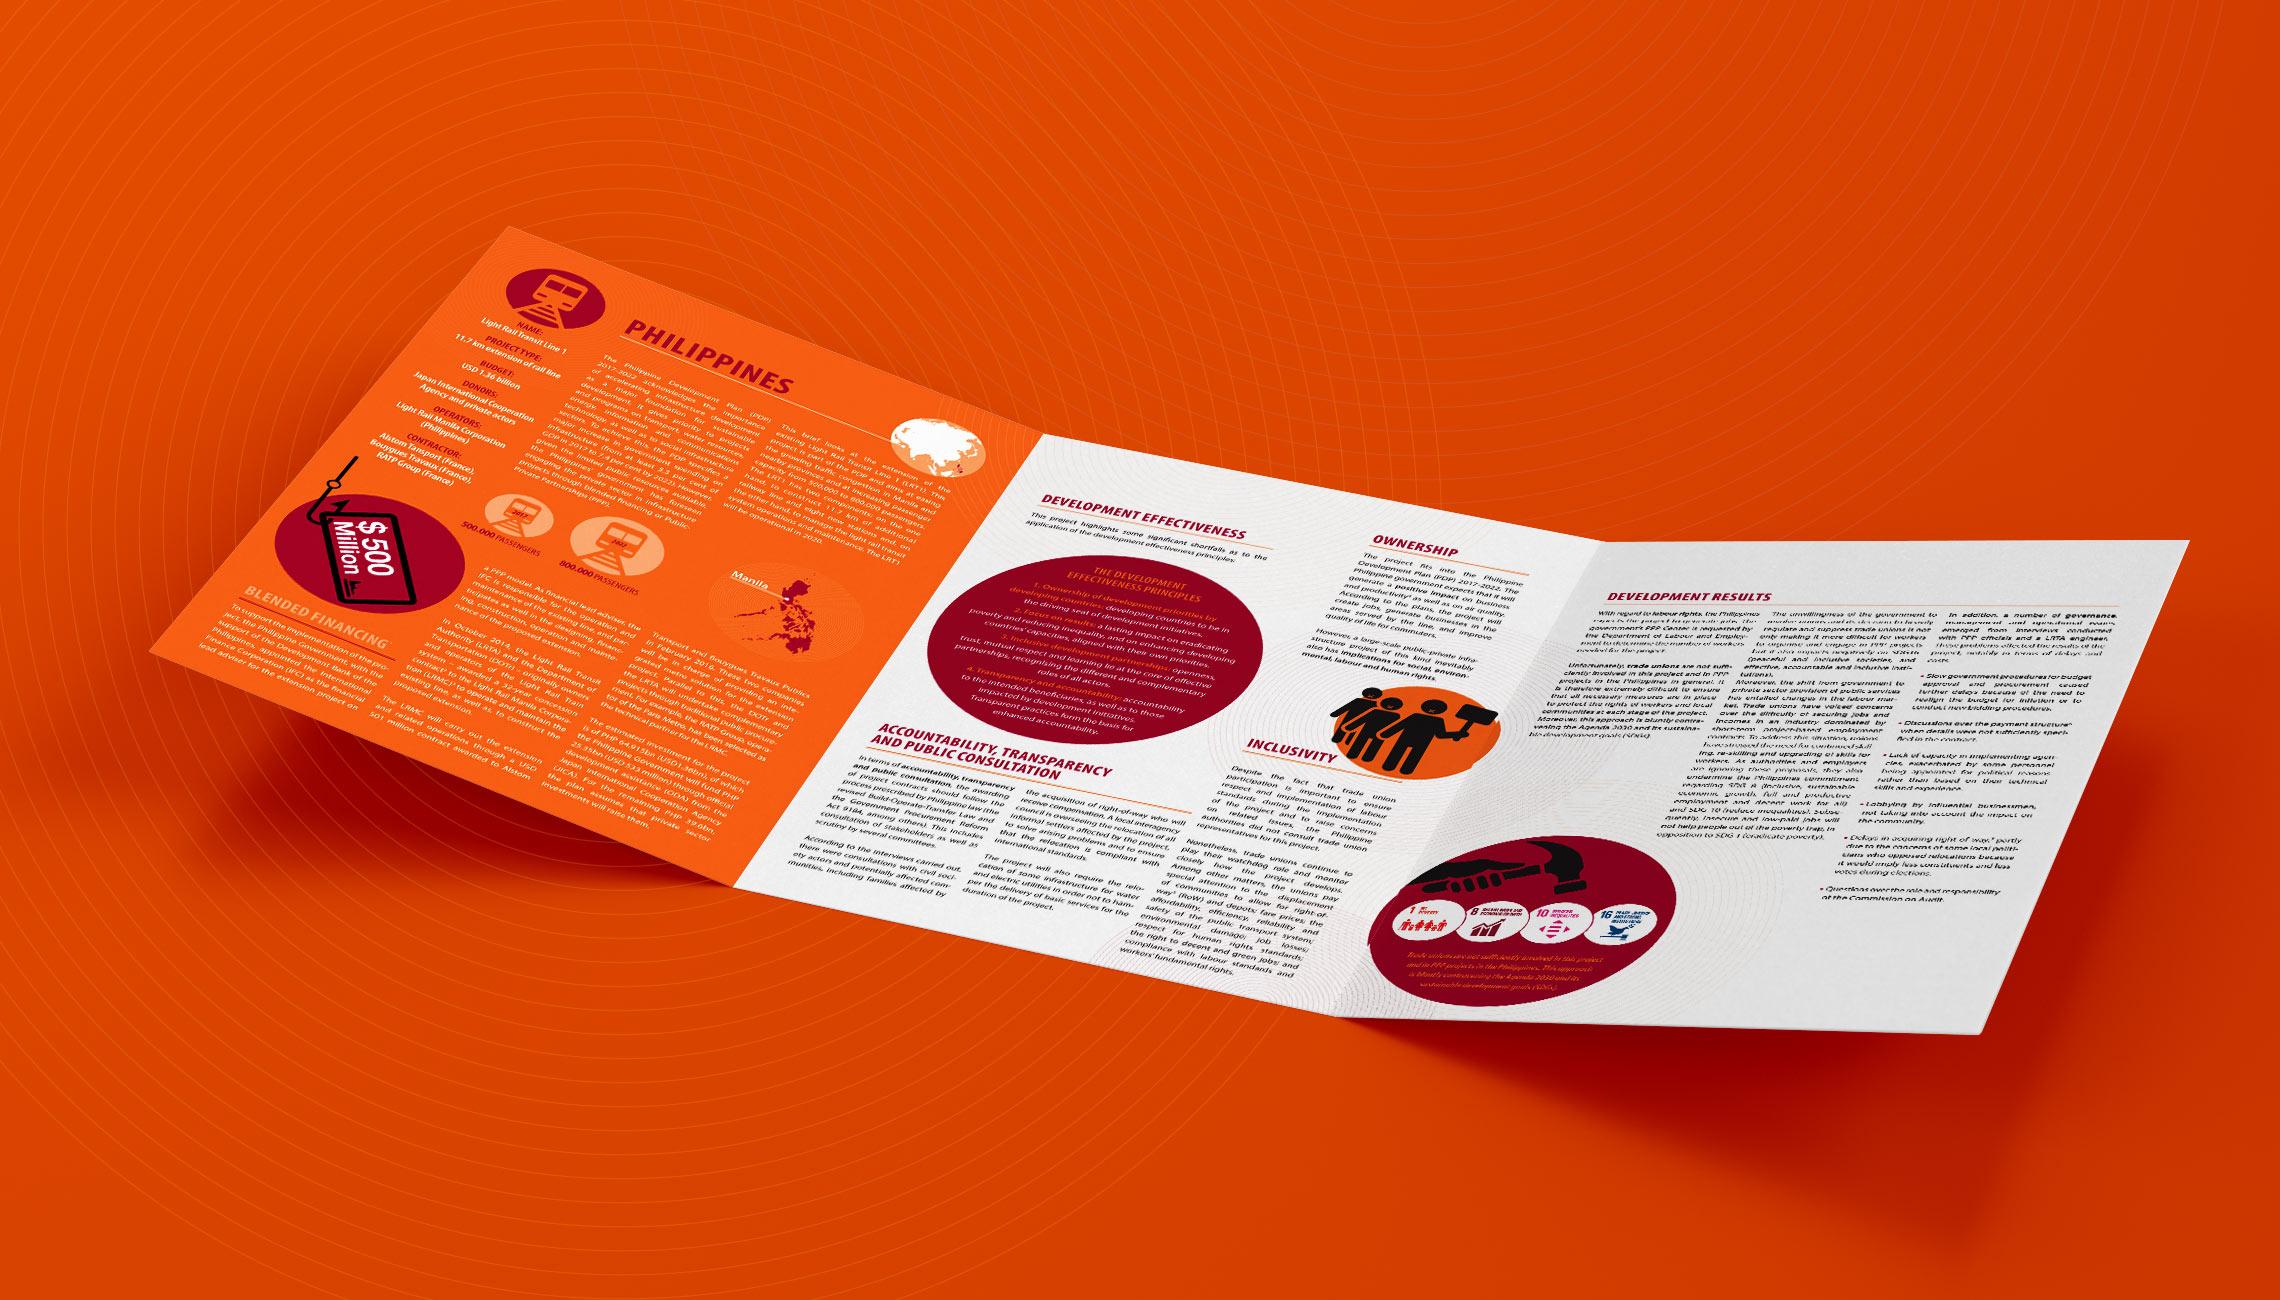 publication: SDGs and development programs impact reports - image 3